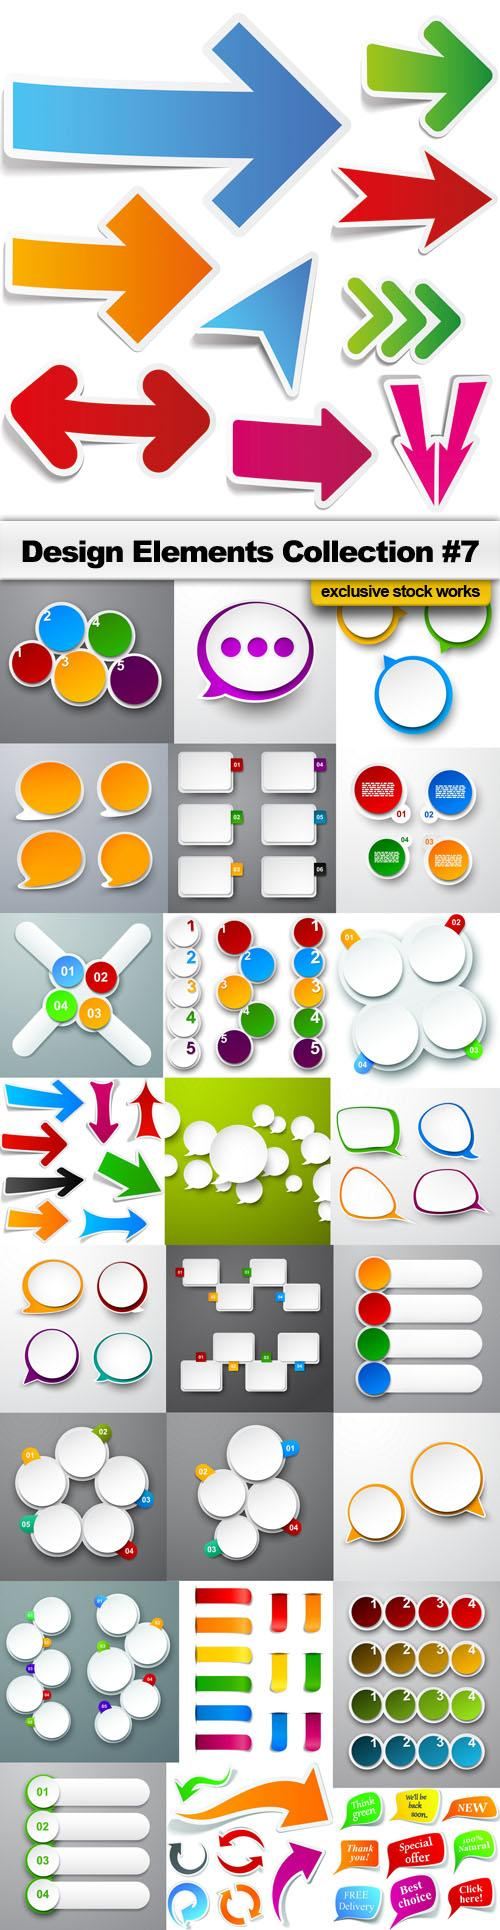 Design Elements Collection #7 – 25 EPS